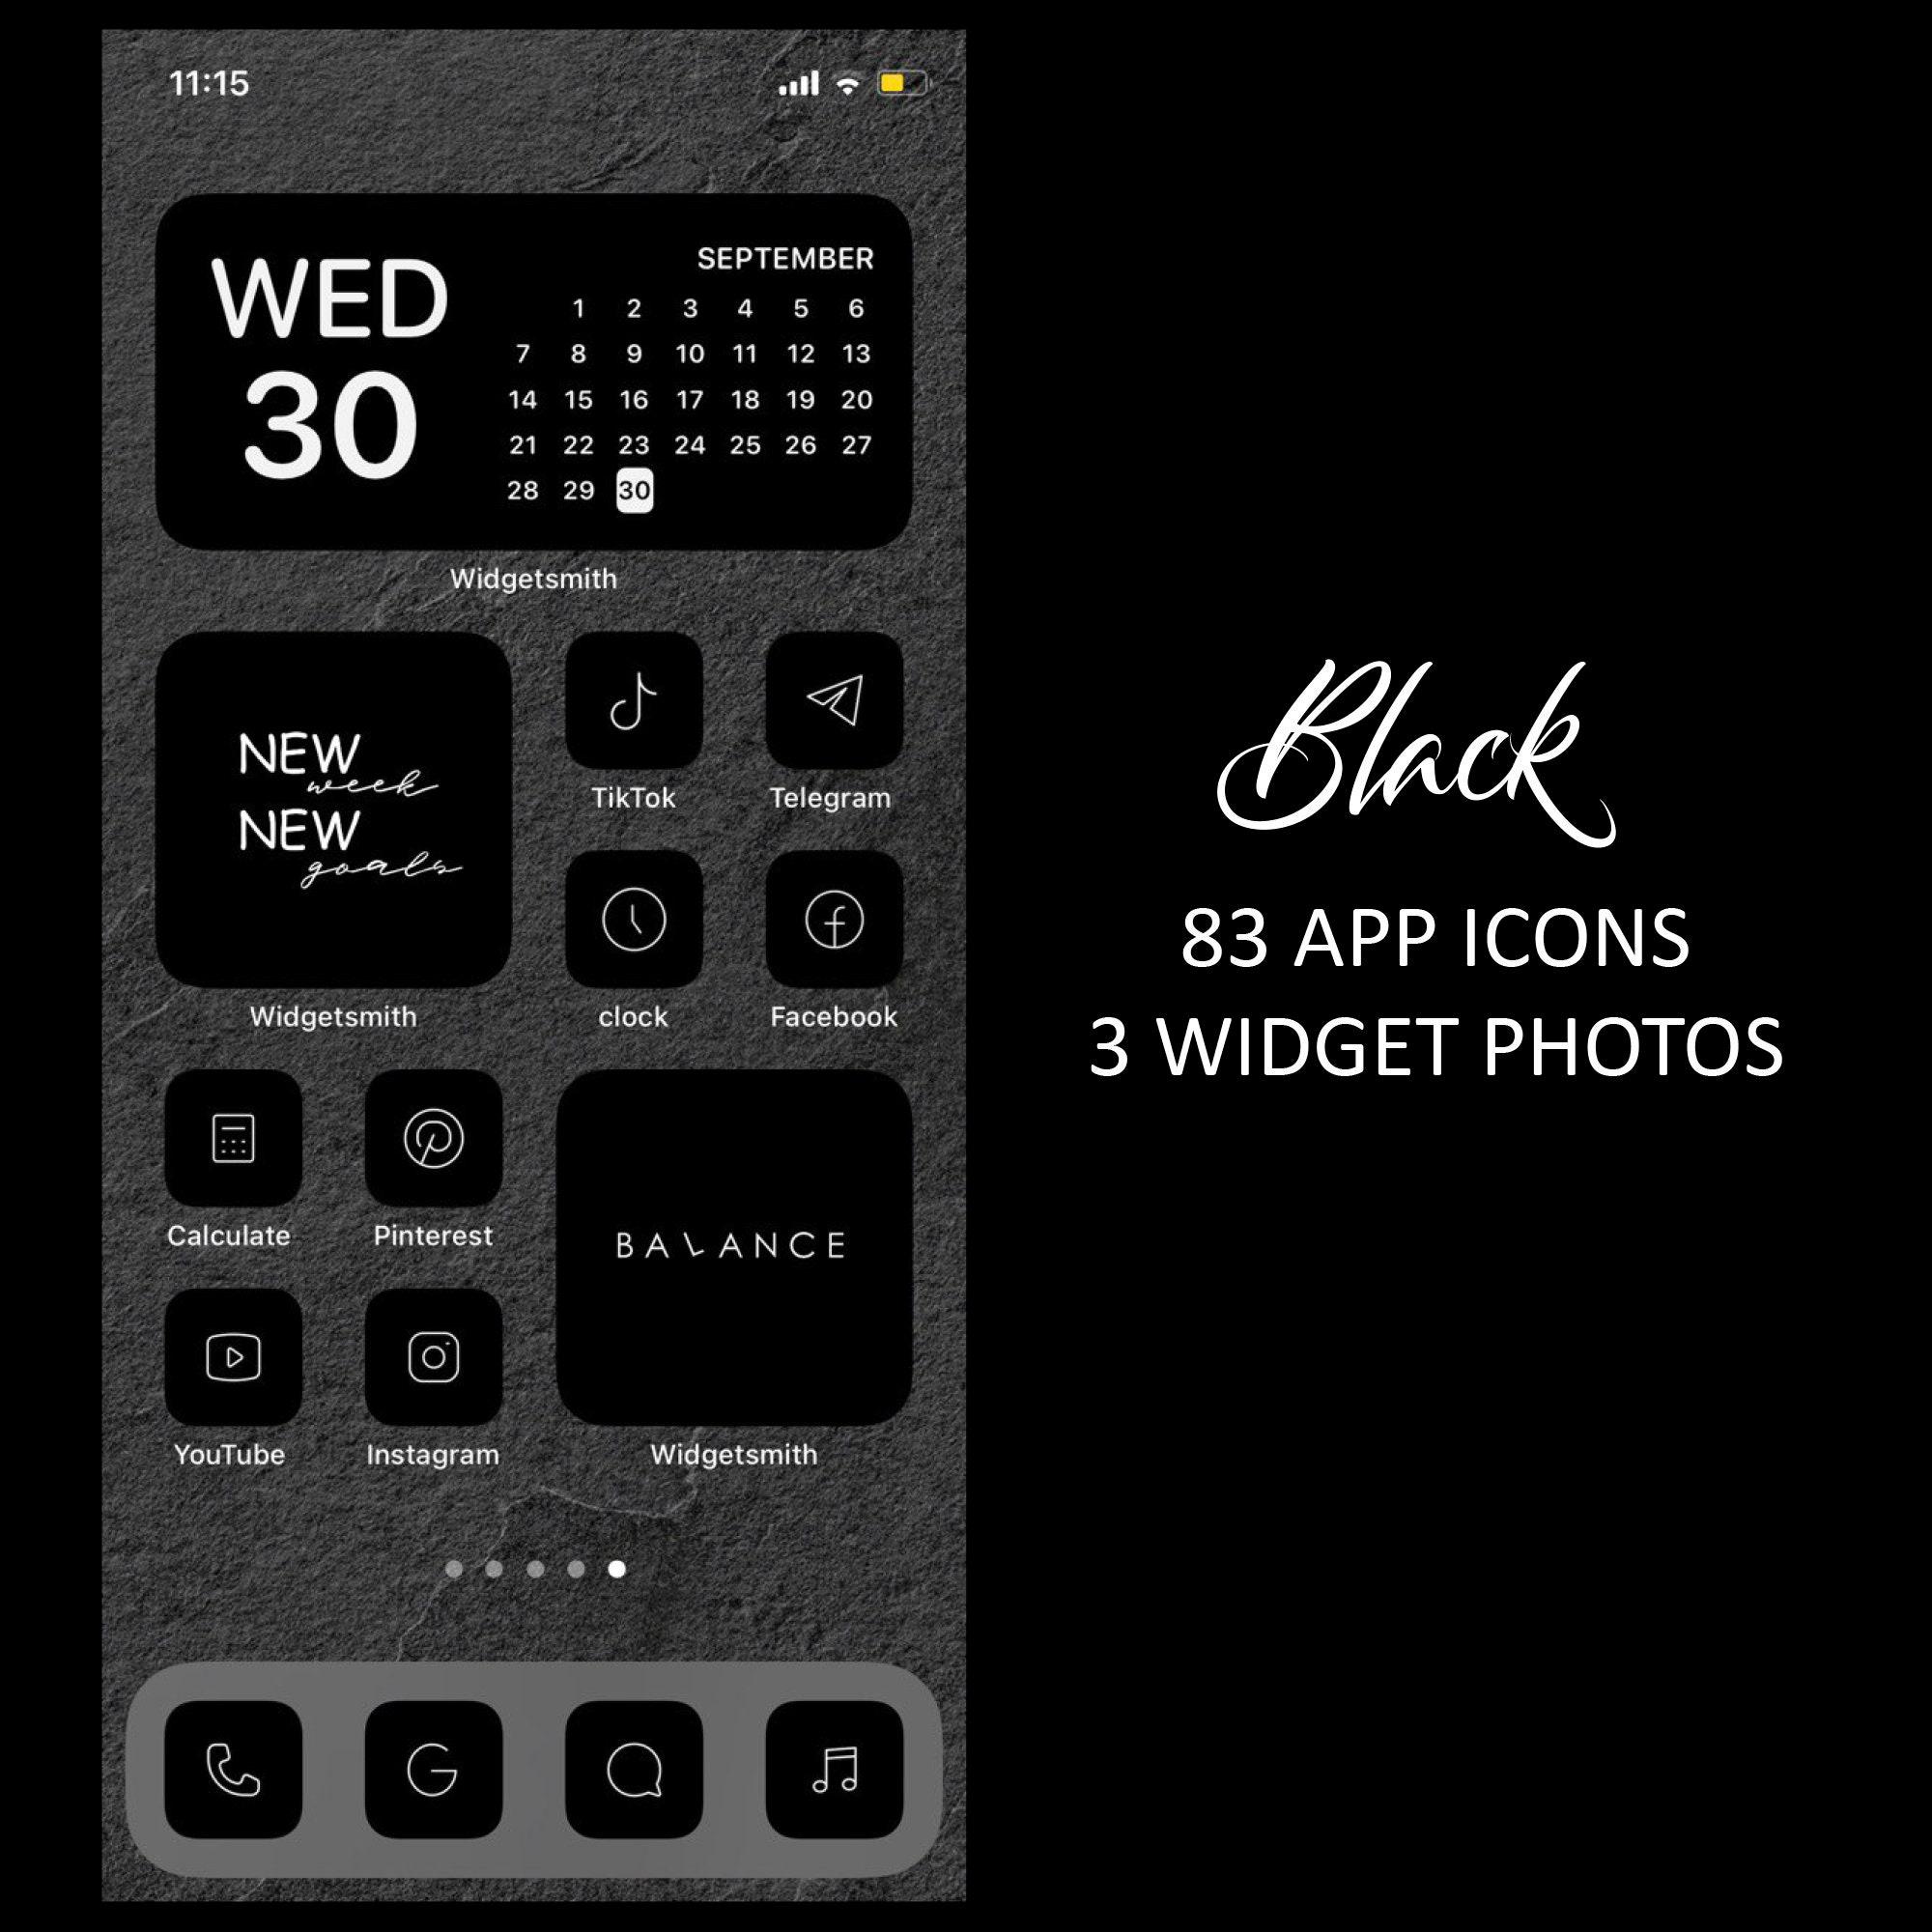 21 Black iOS 21 App Icons Dark Mode Widget iOS 21 Cover Widgetsmith  Aesthetic Minimal Icon Iphone Apple Pack Icons Set Shortcut Aesthetic